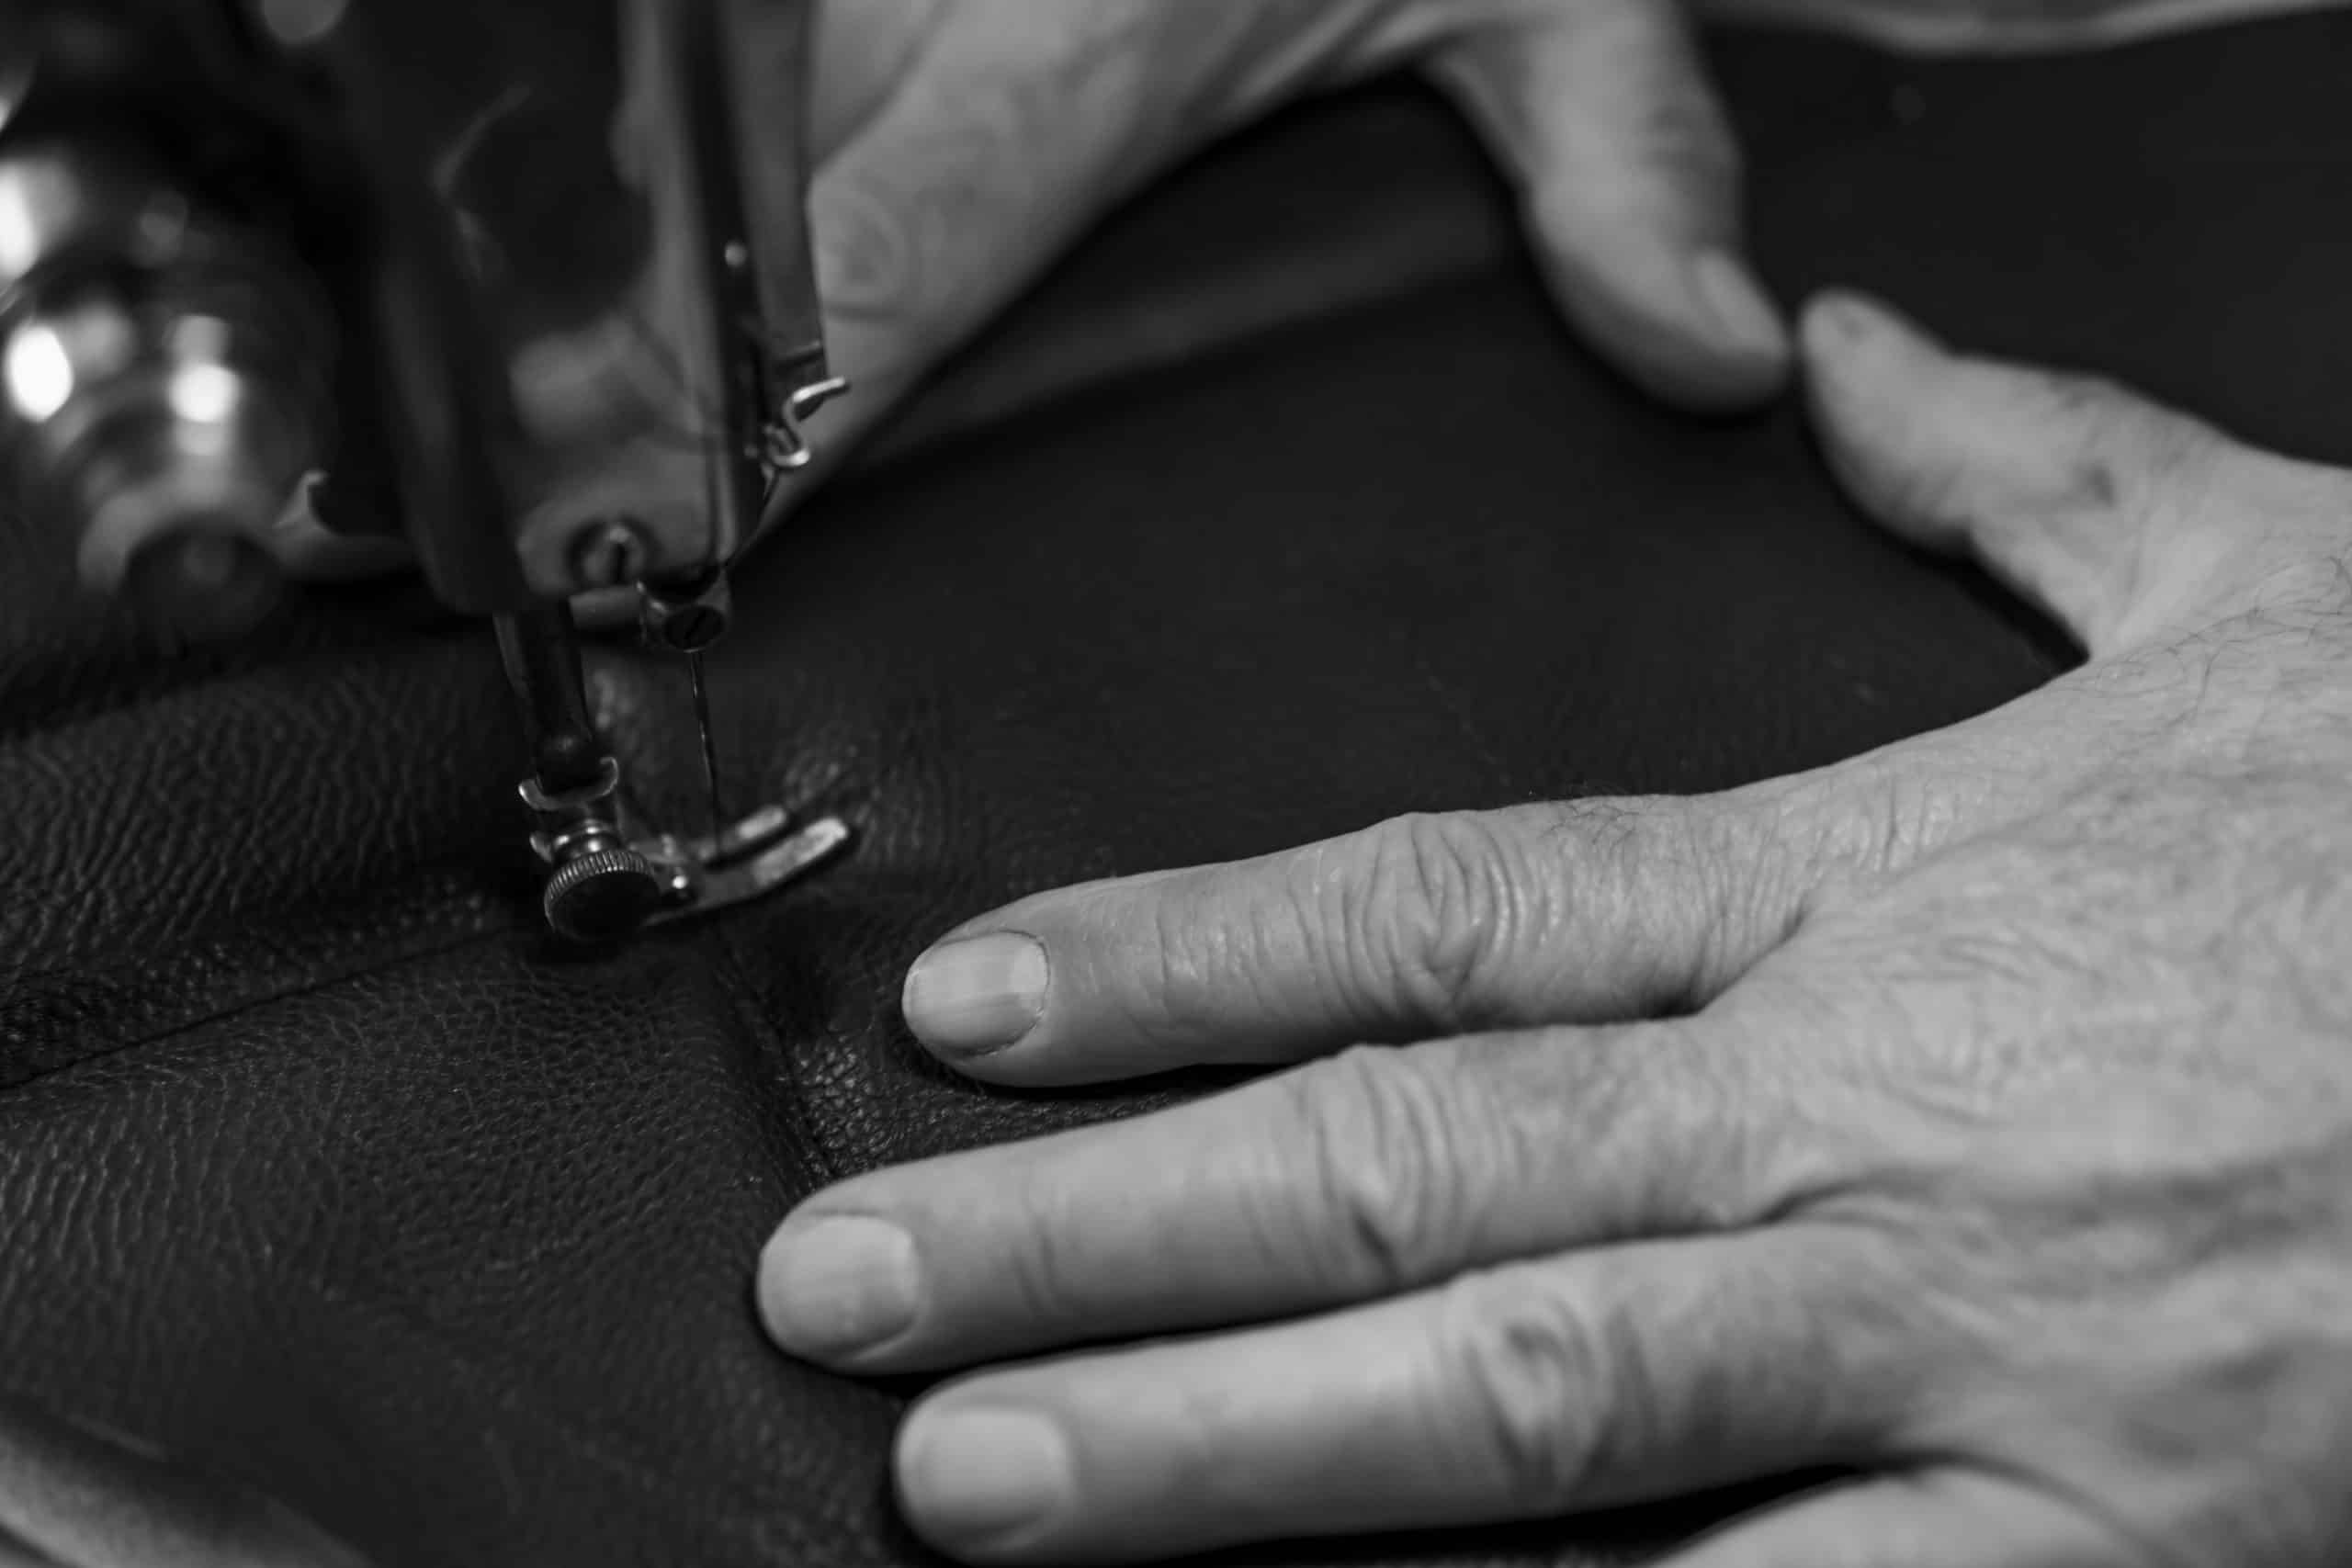 4 Key Factors to Consider When Choosing a Marine Upholsterer